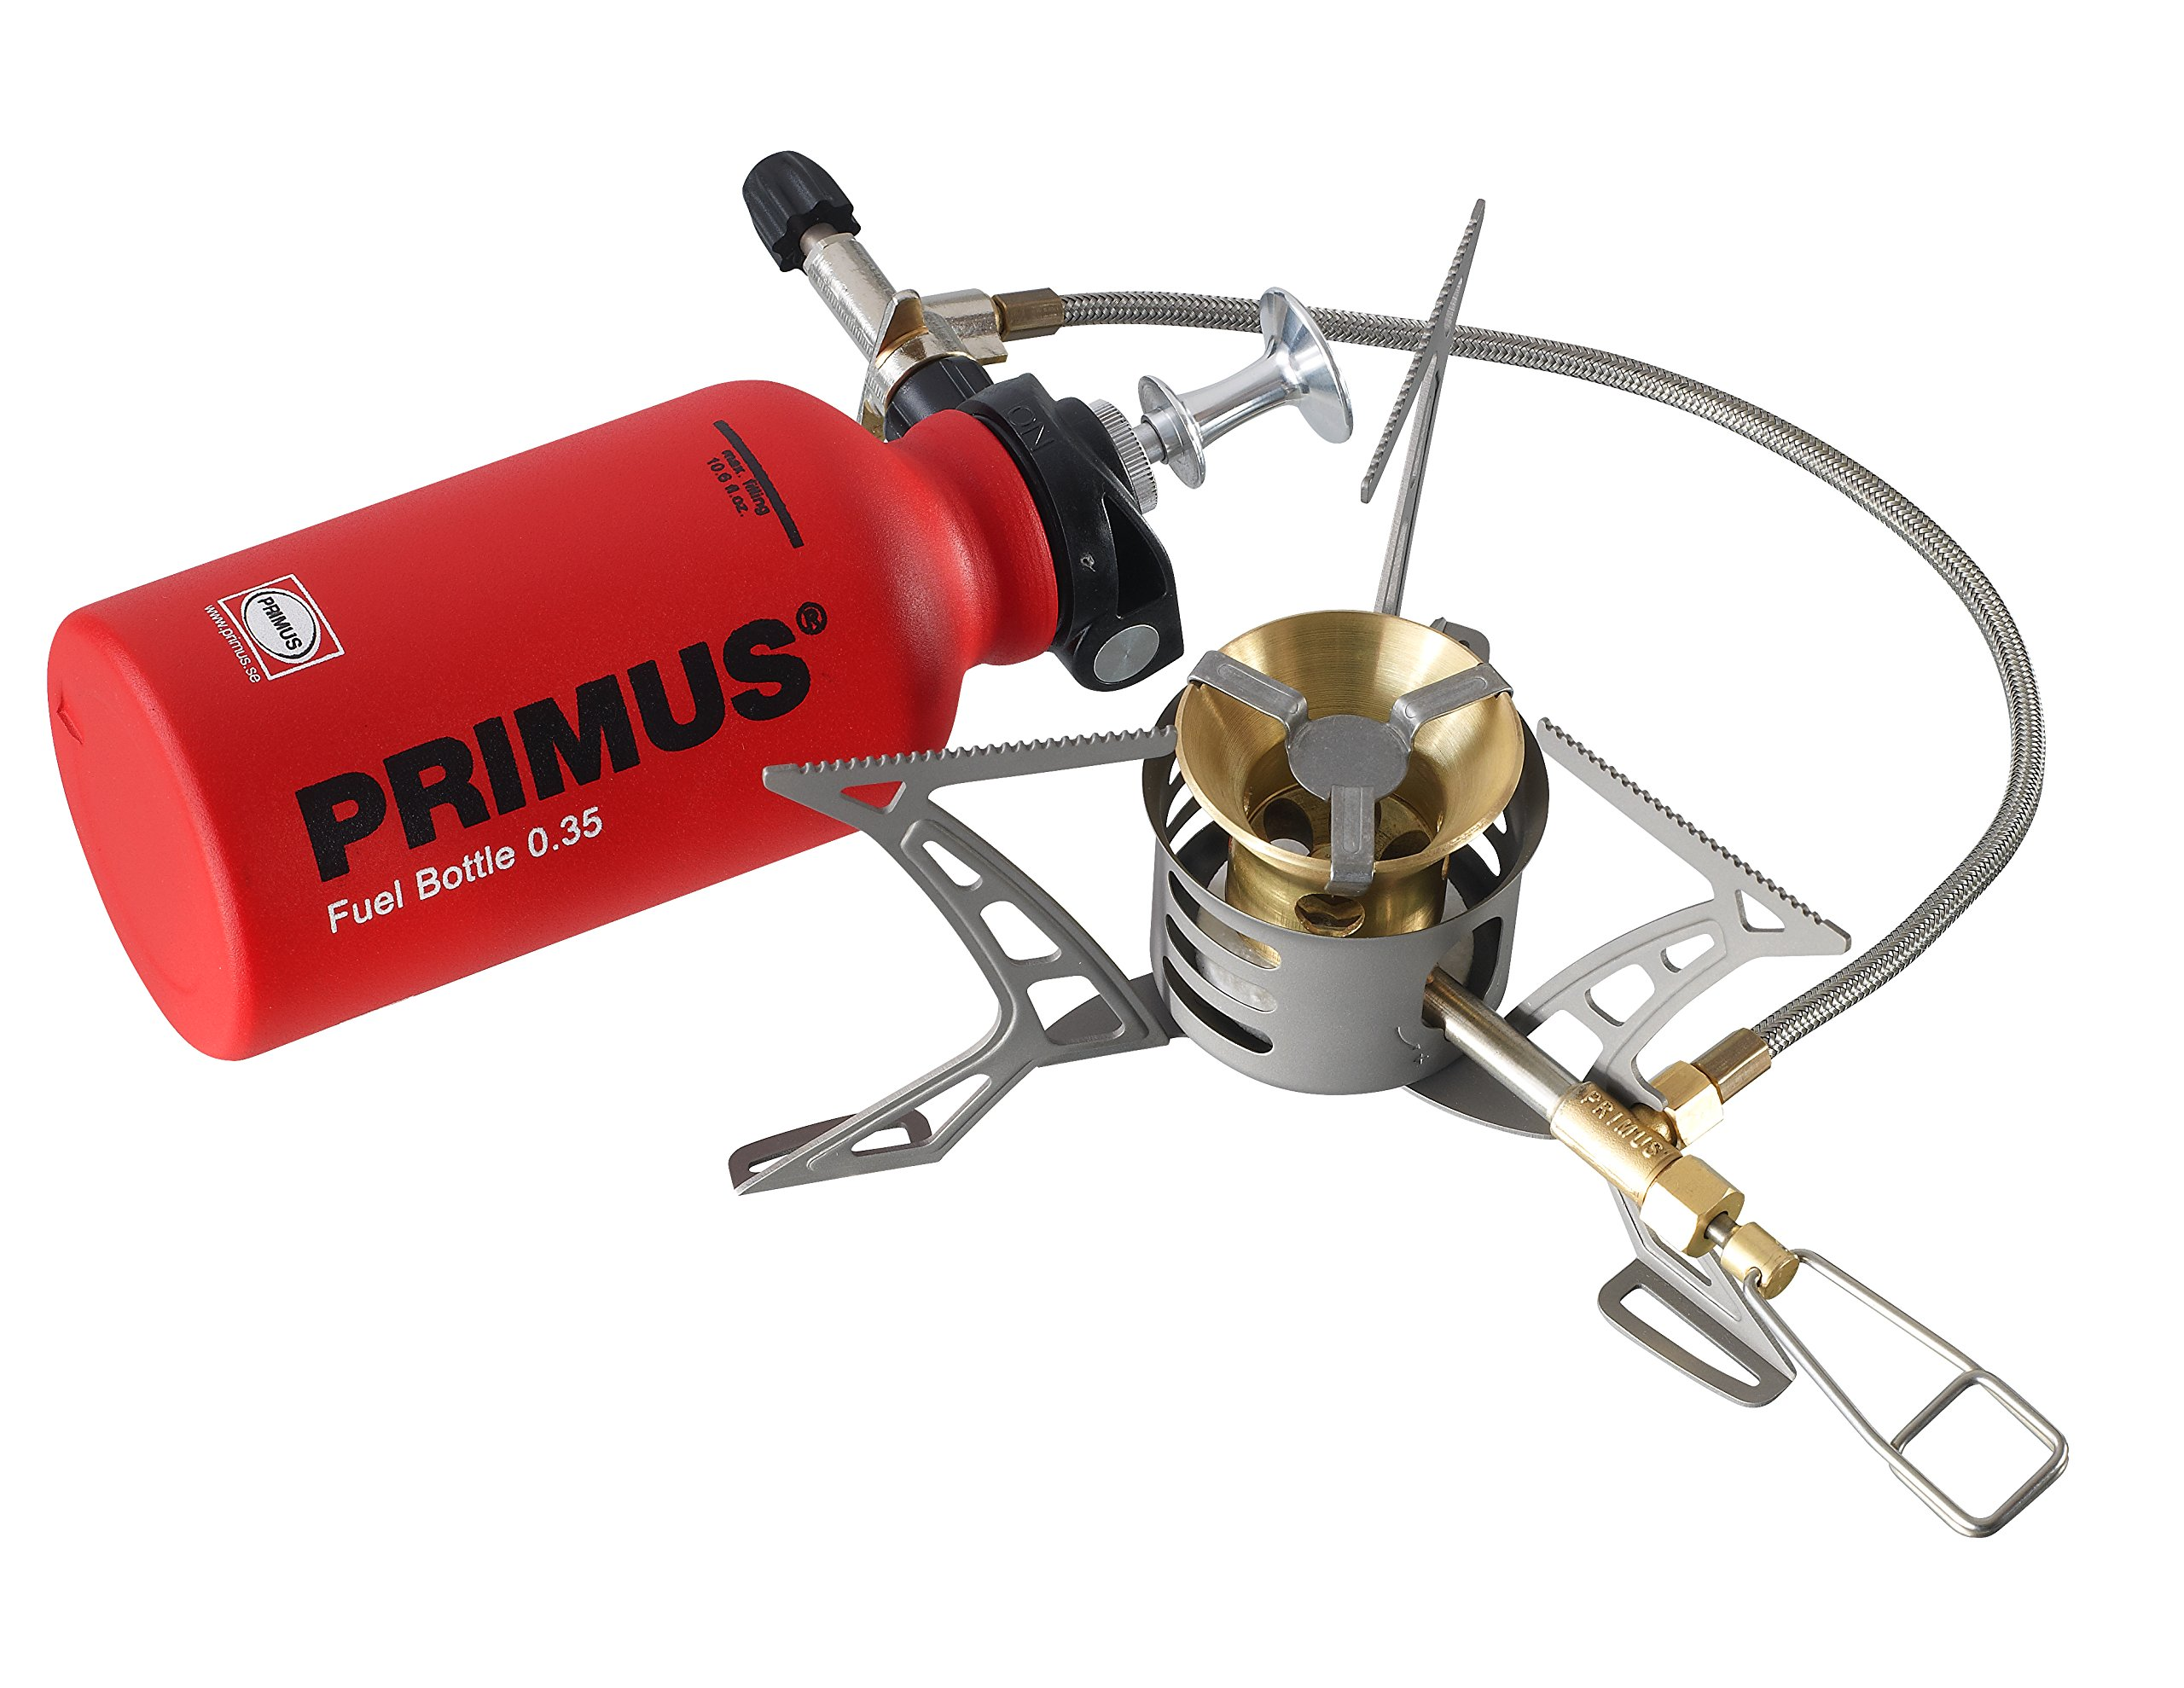 Primus OmniLite TI camping stove grey camping stove by Primus (Image #2)